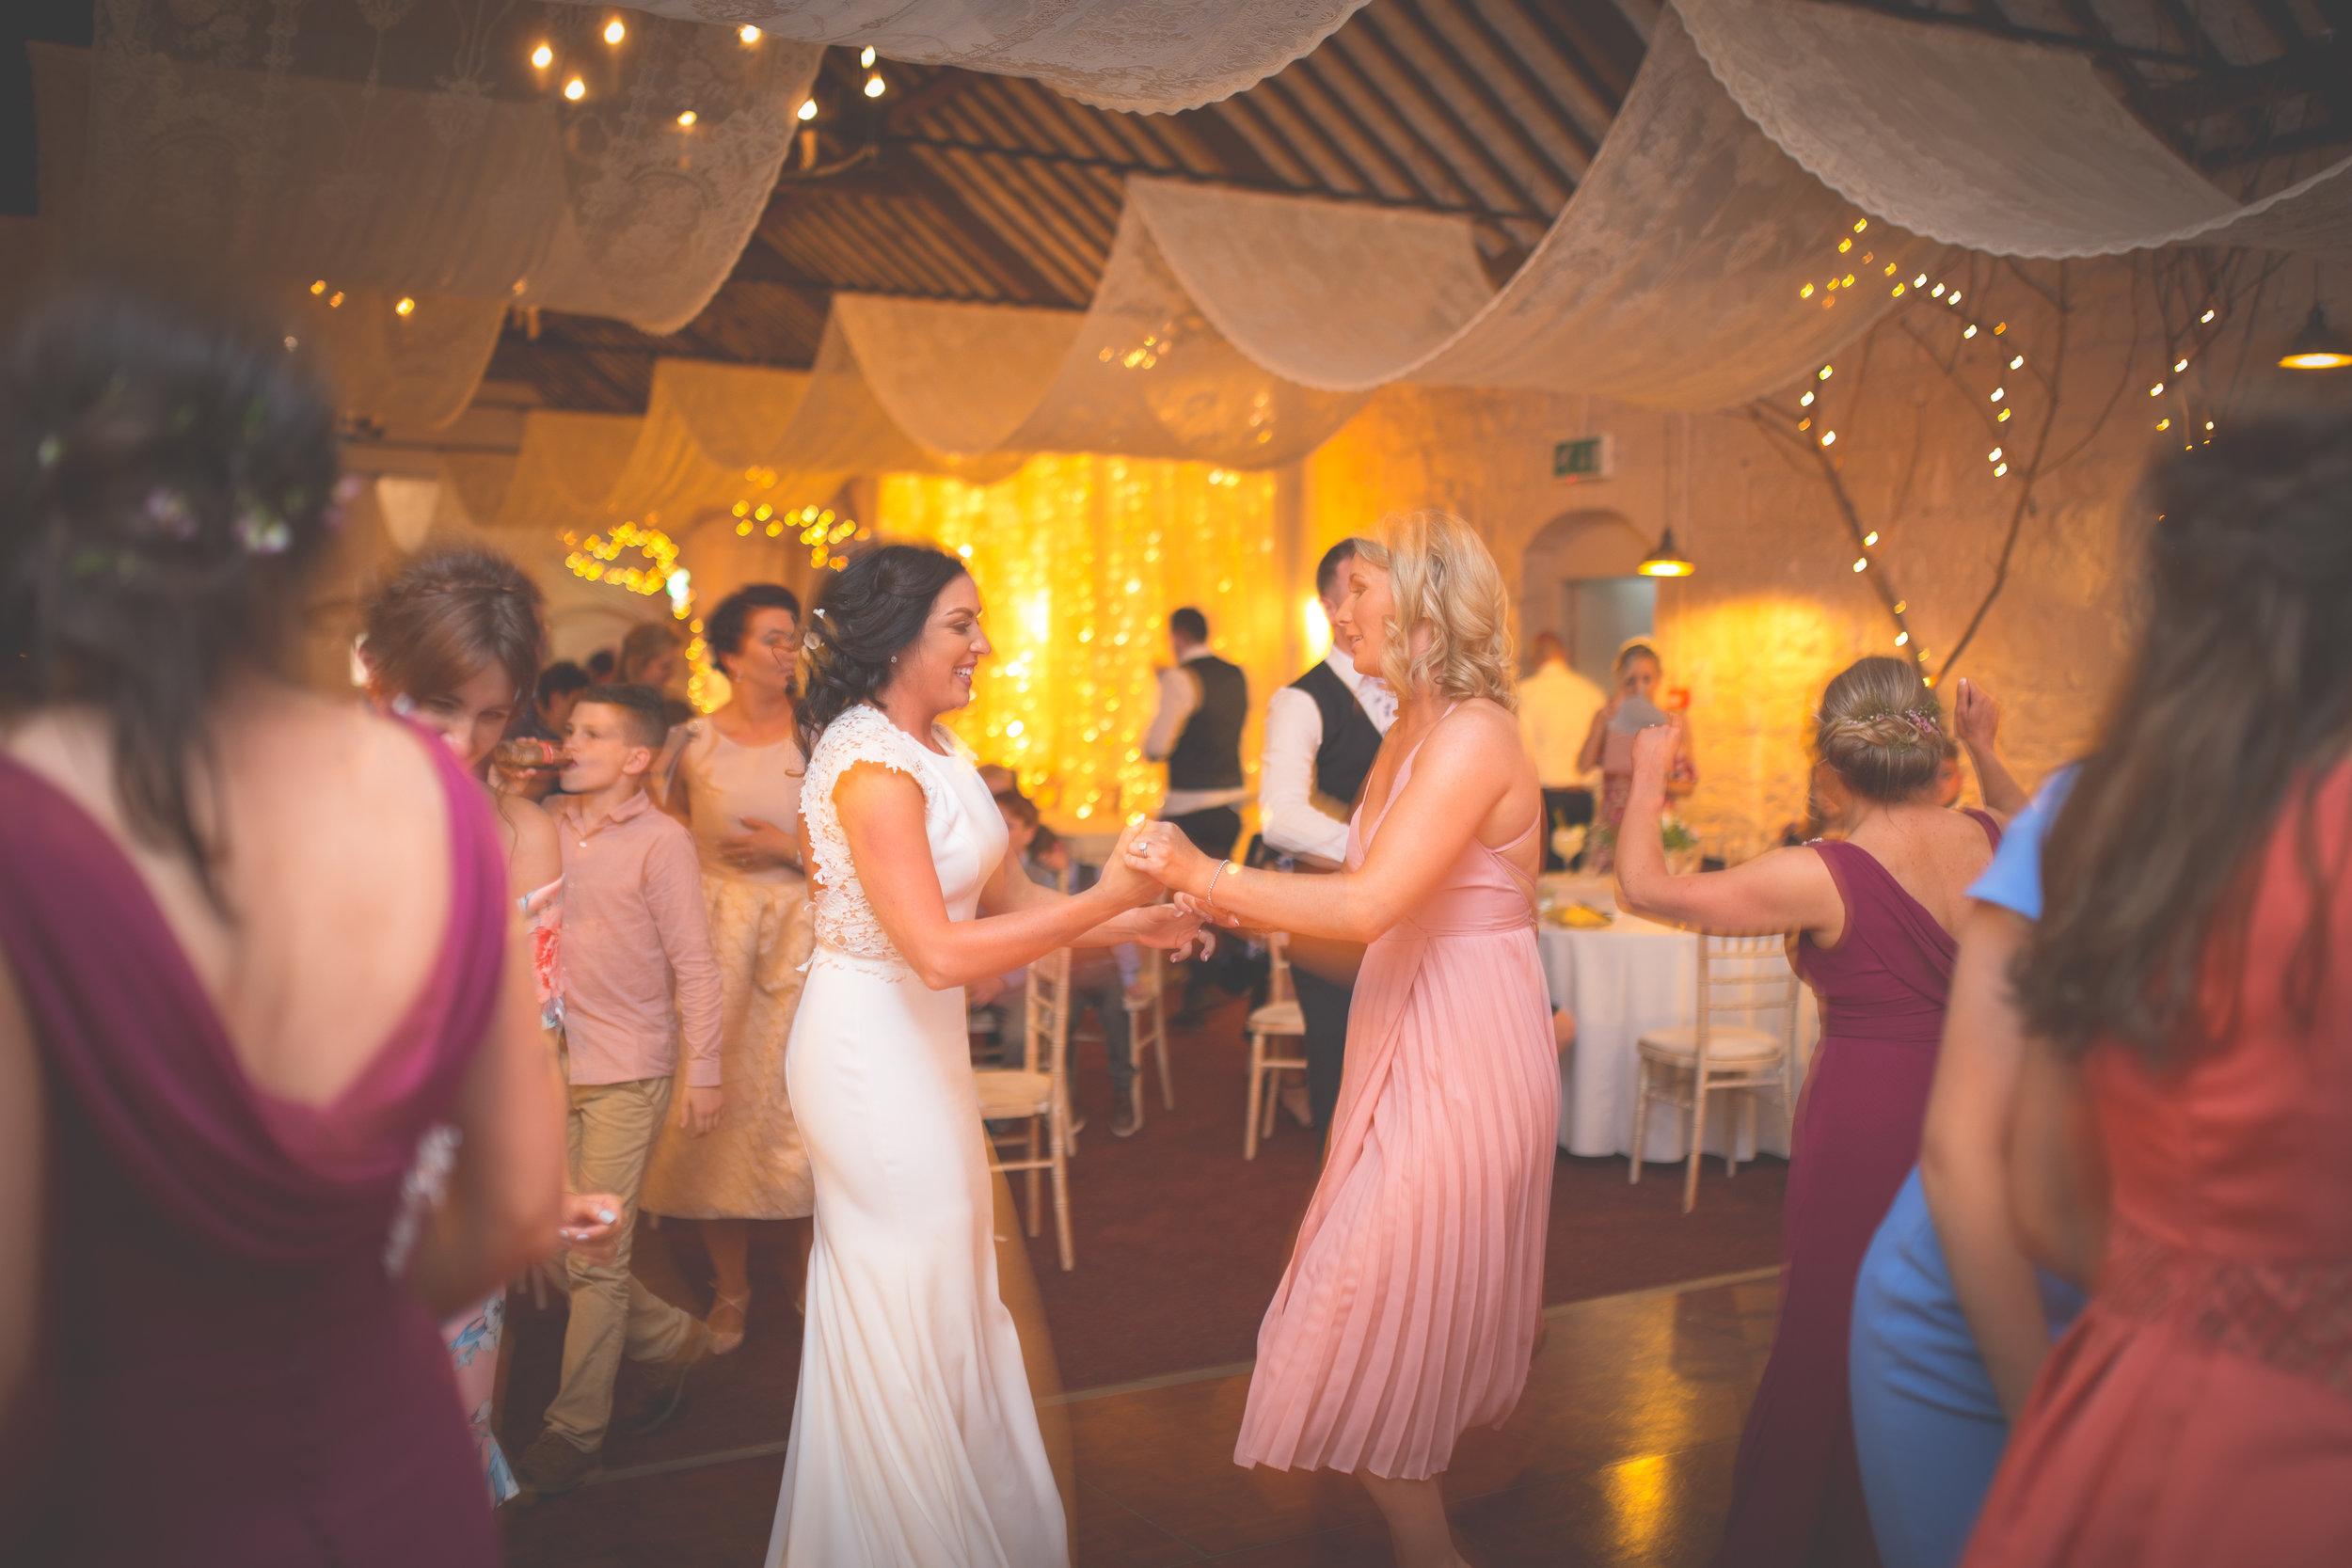 Brian McEwan Wedding Photography | Carol-Annee & Sean | The Dancing-85.jpg